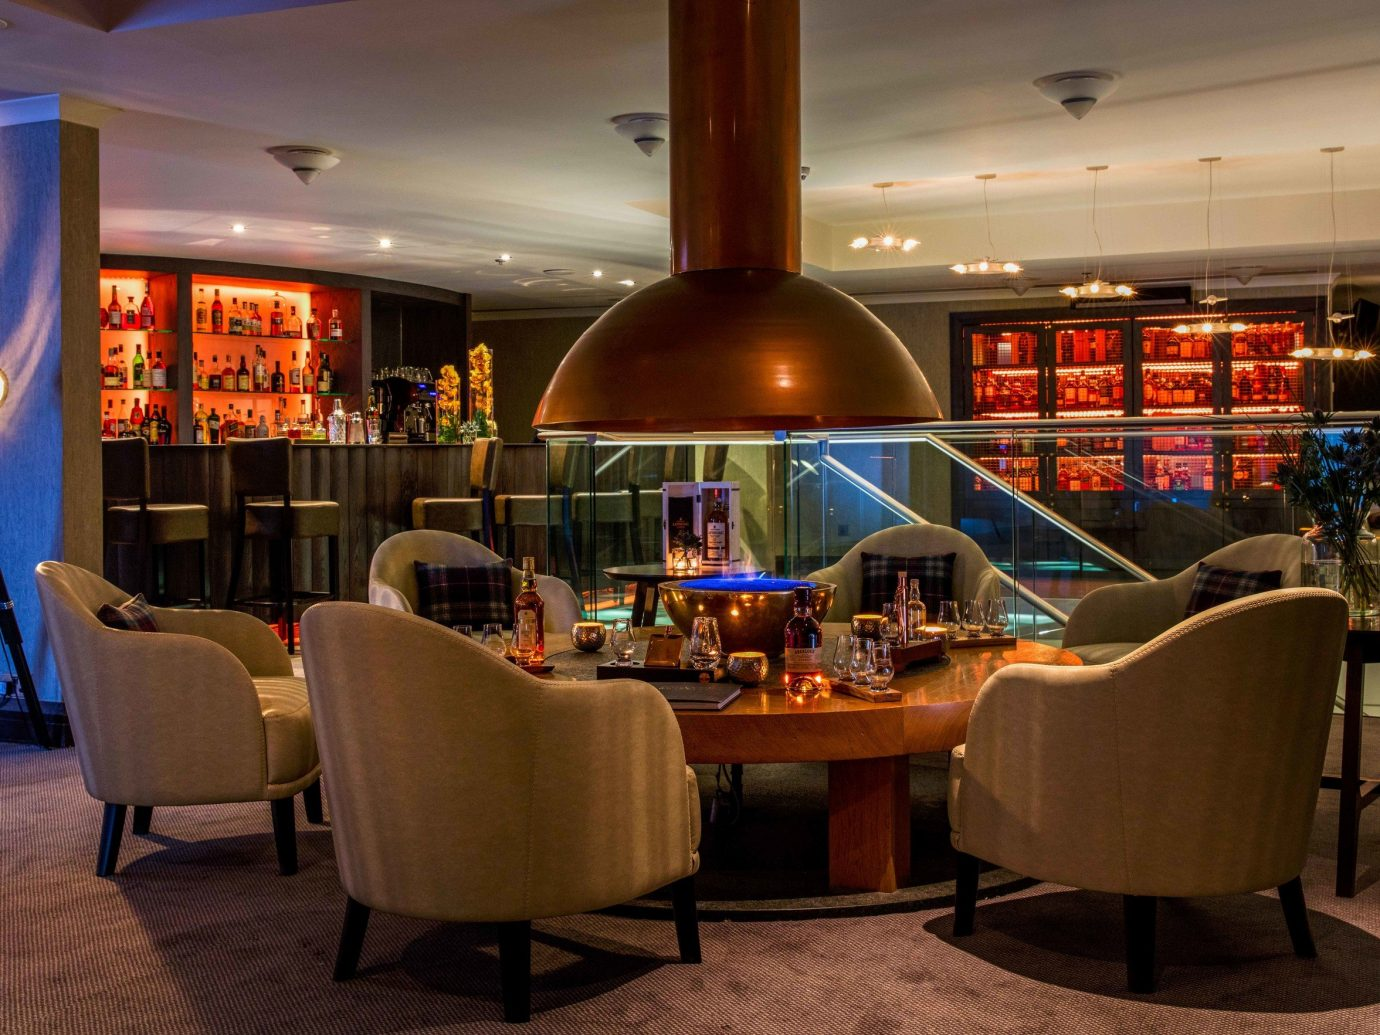 Edinburgh Hotels Jetsetter Guides Scotland Travel Tips Trip Ideas indoor floor ceiling room wall chair Living interior design restaurant Lobby table furniture area